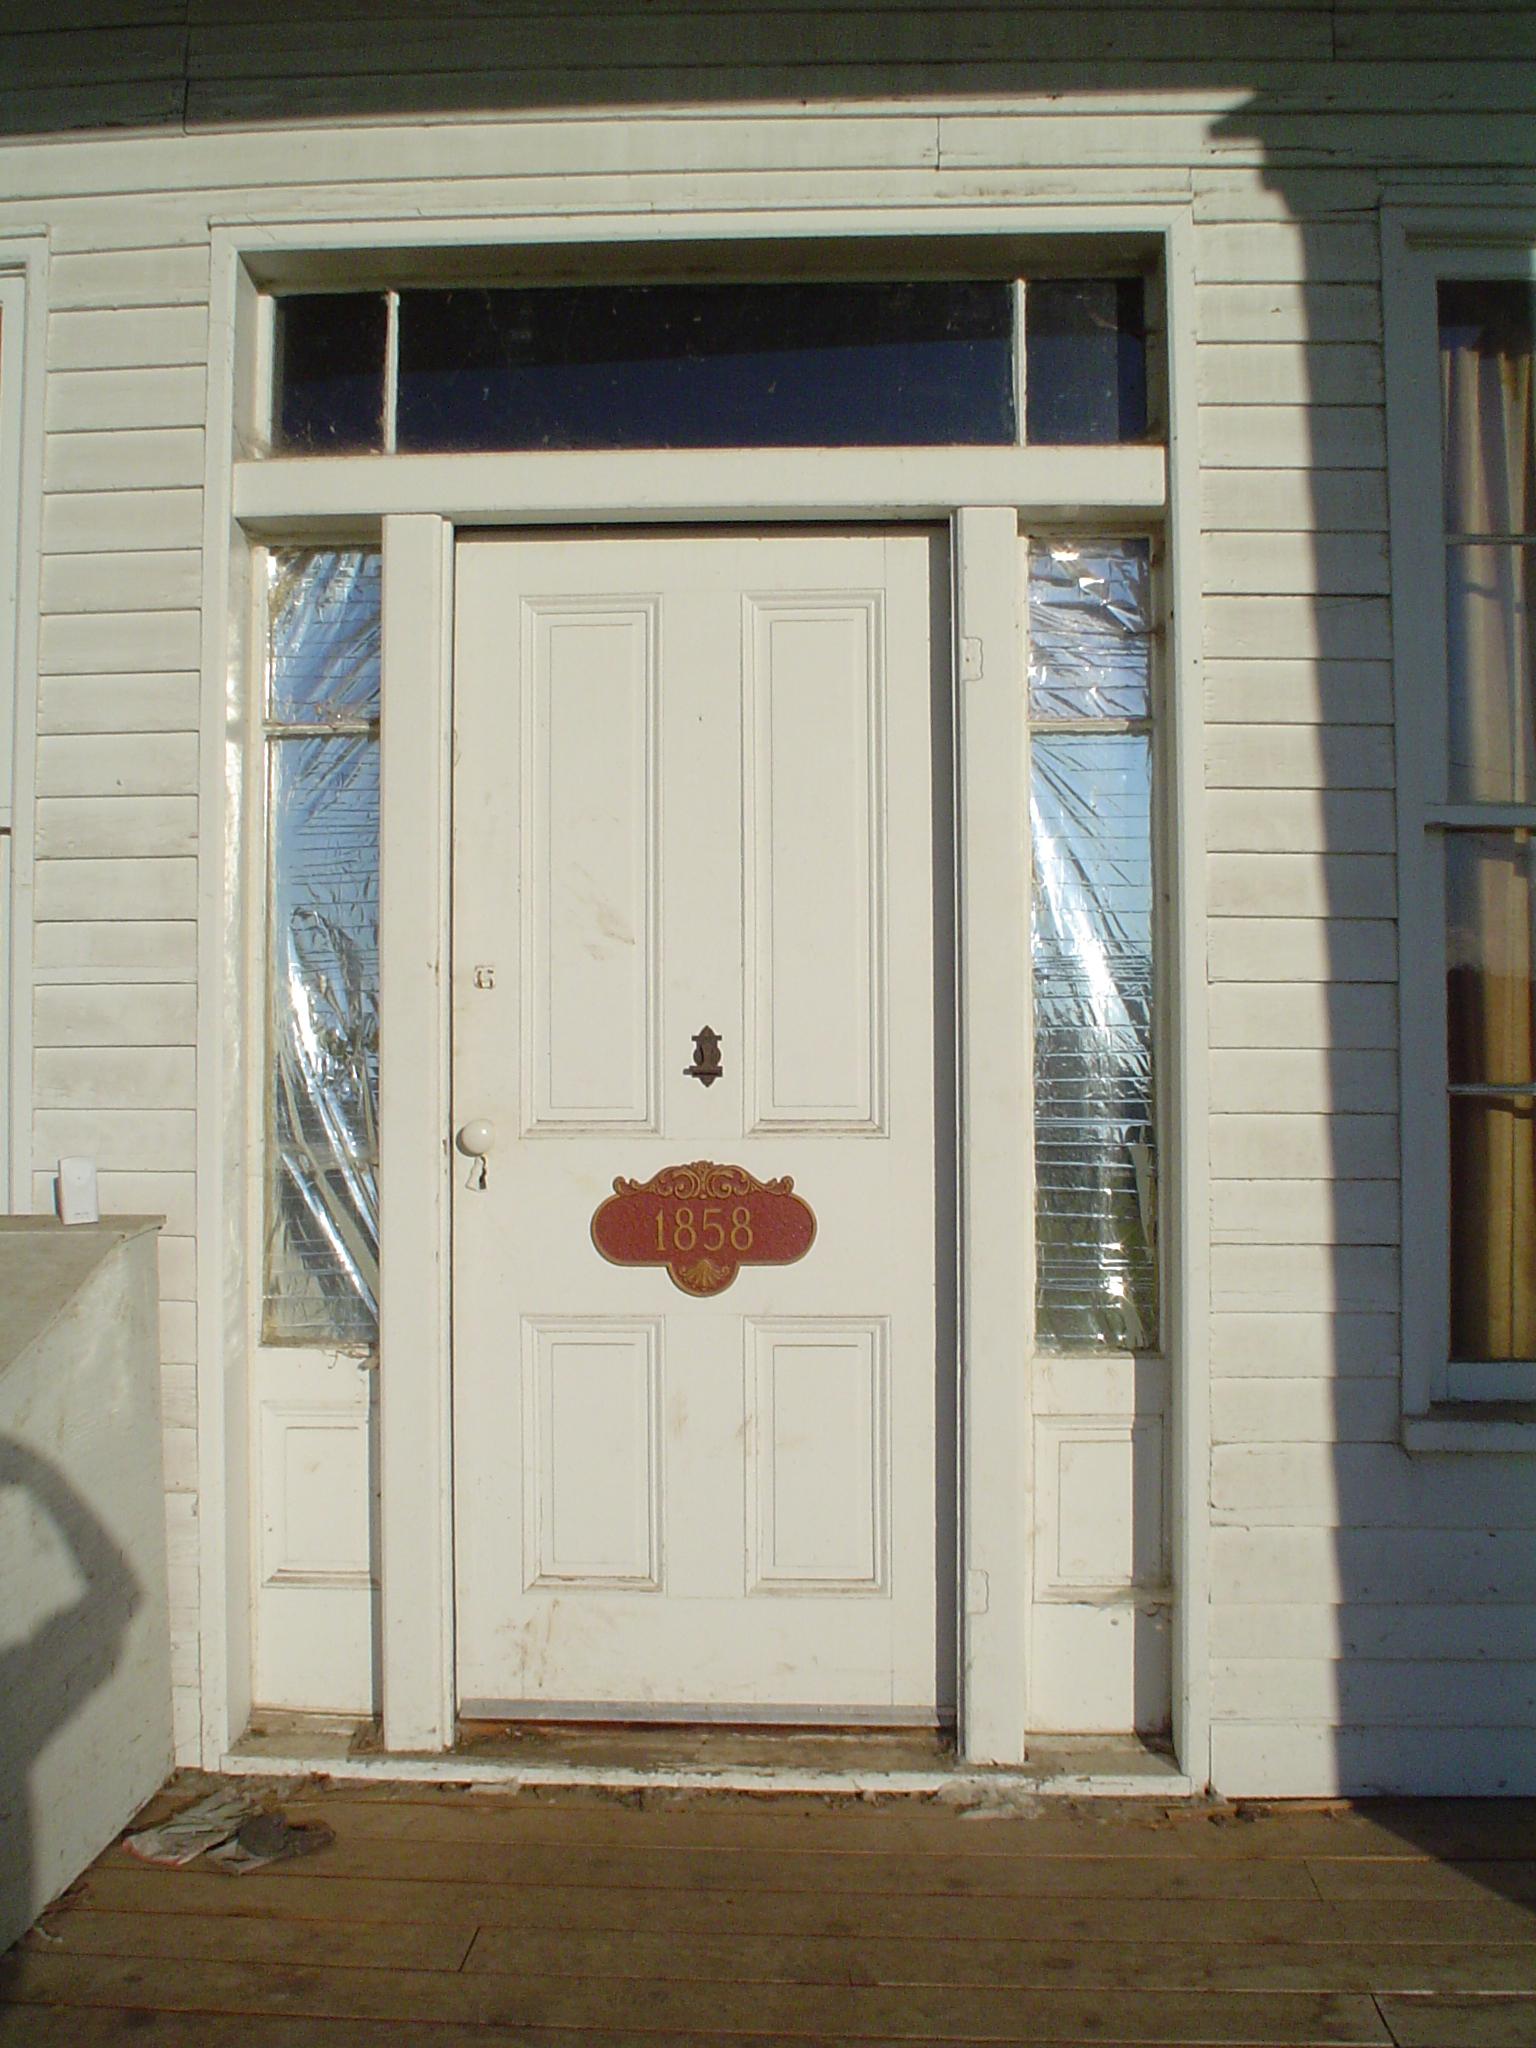 FileSam Brown House door.JPG & File:Sam Brown House door.JPG - Wikimedia Commons pezcame.com